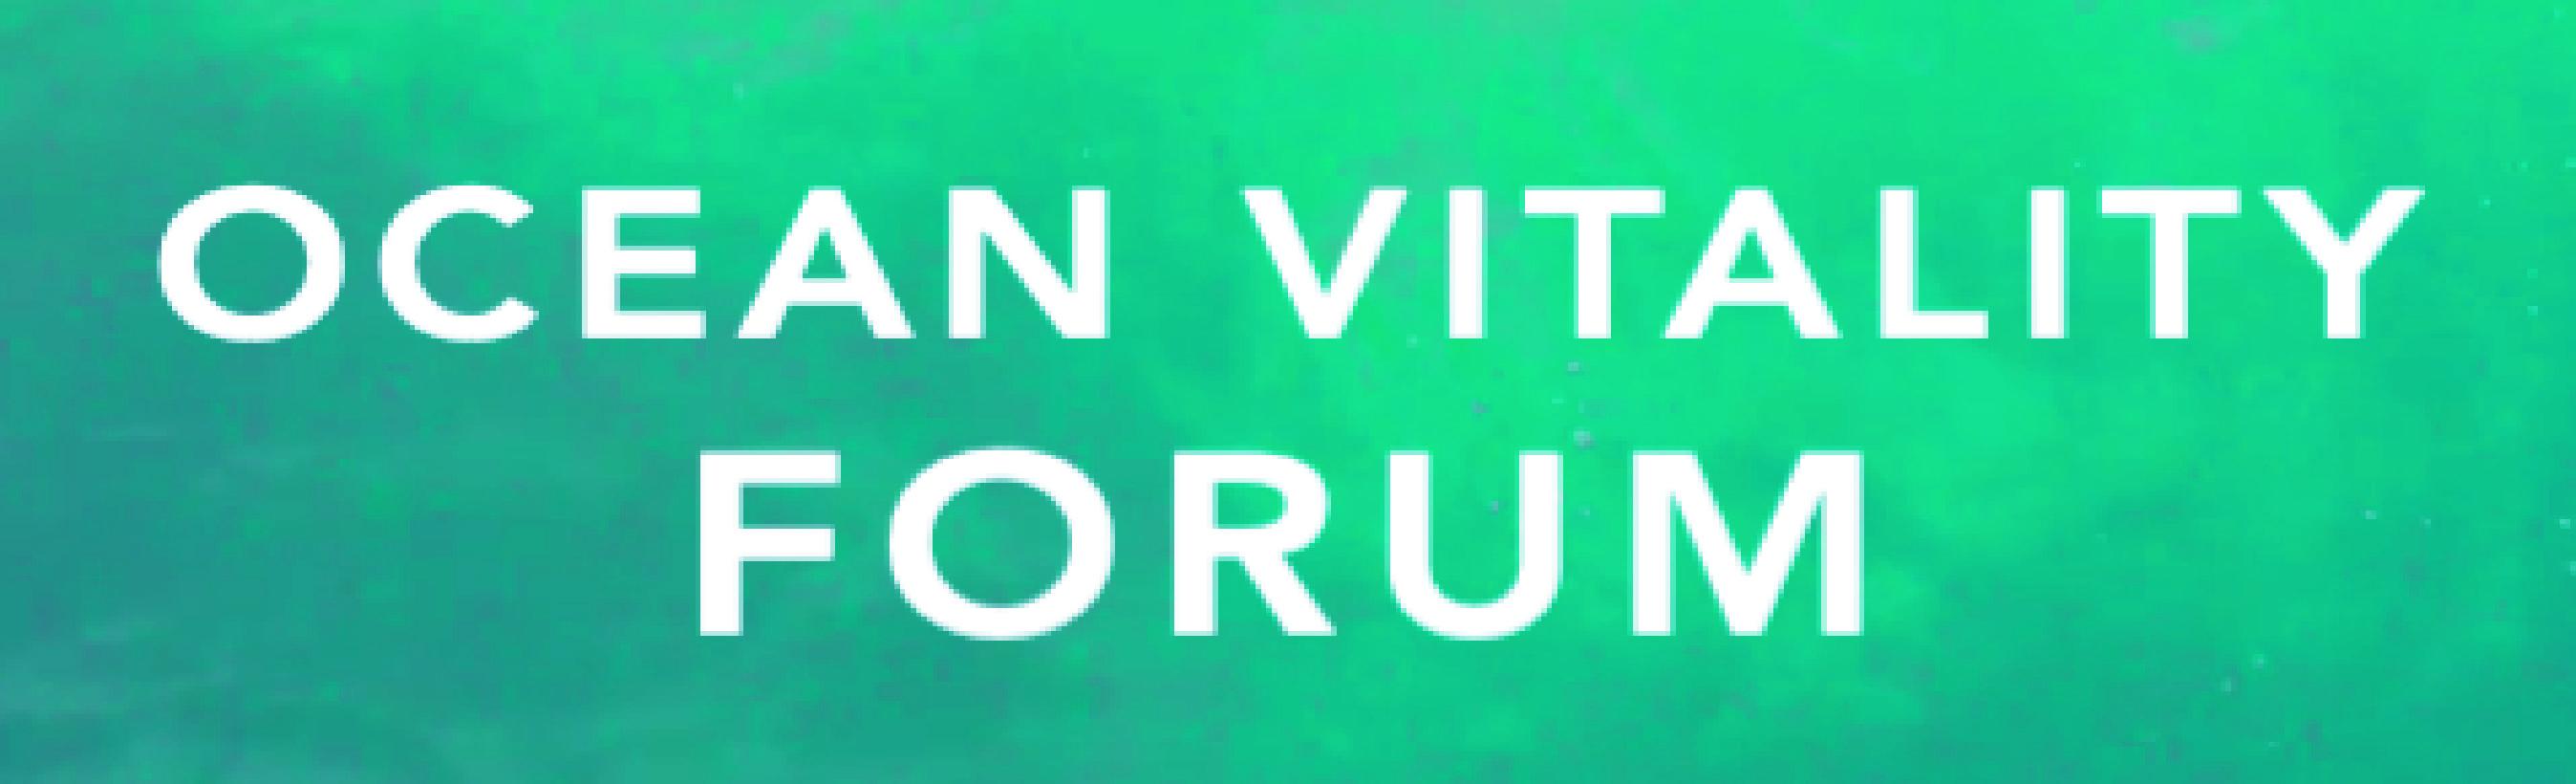 Ocean Vitality Forum